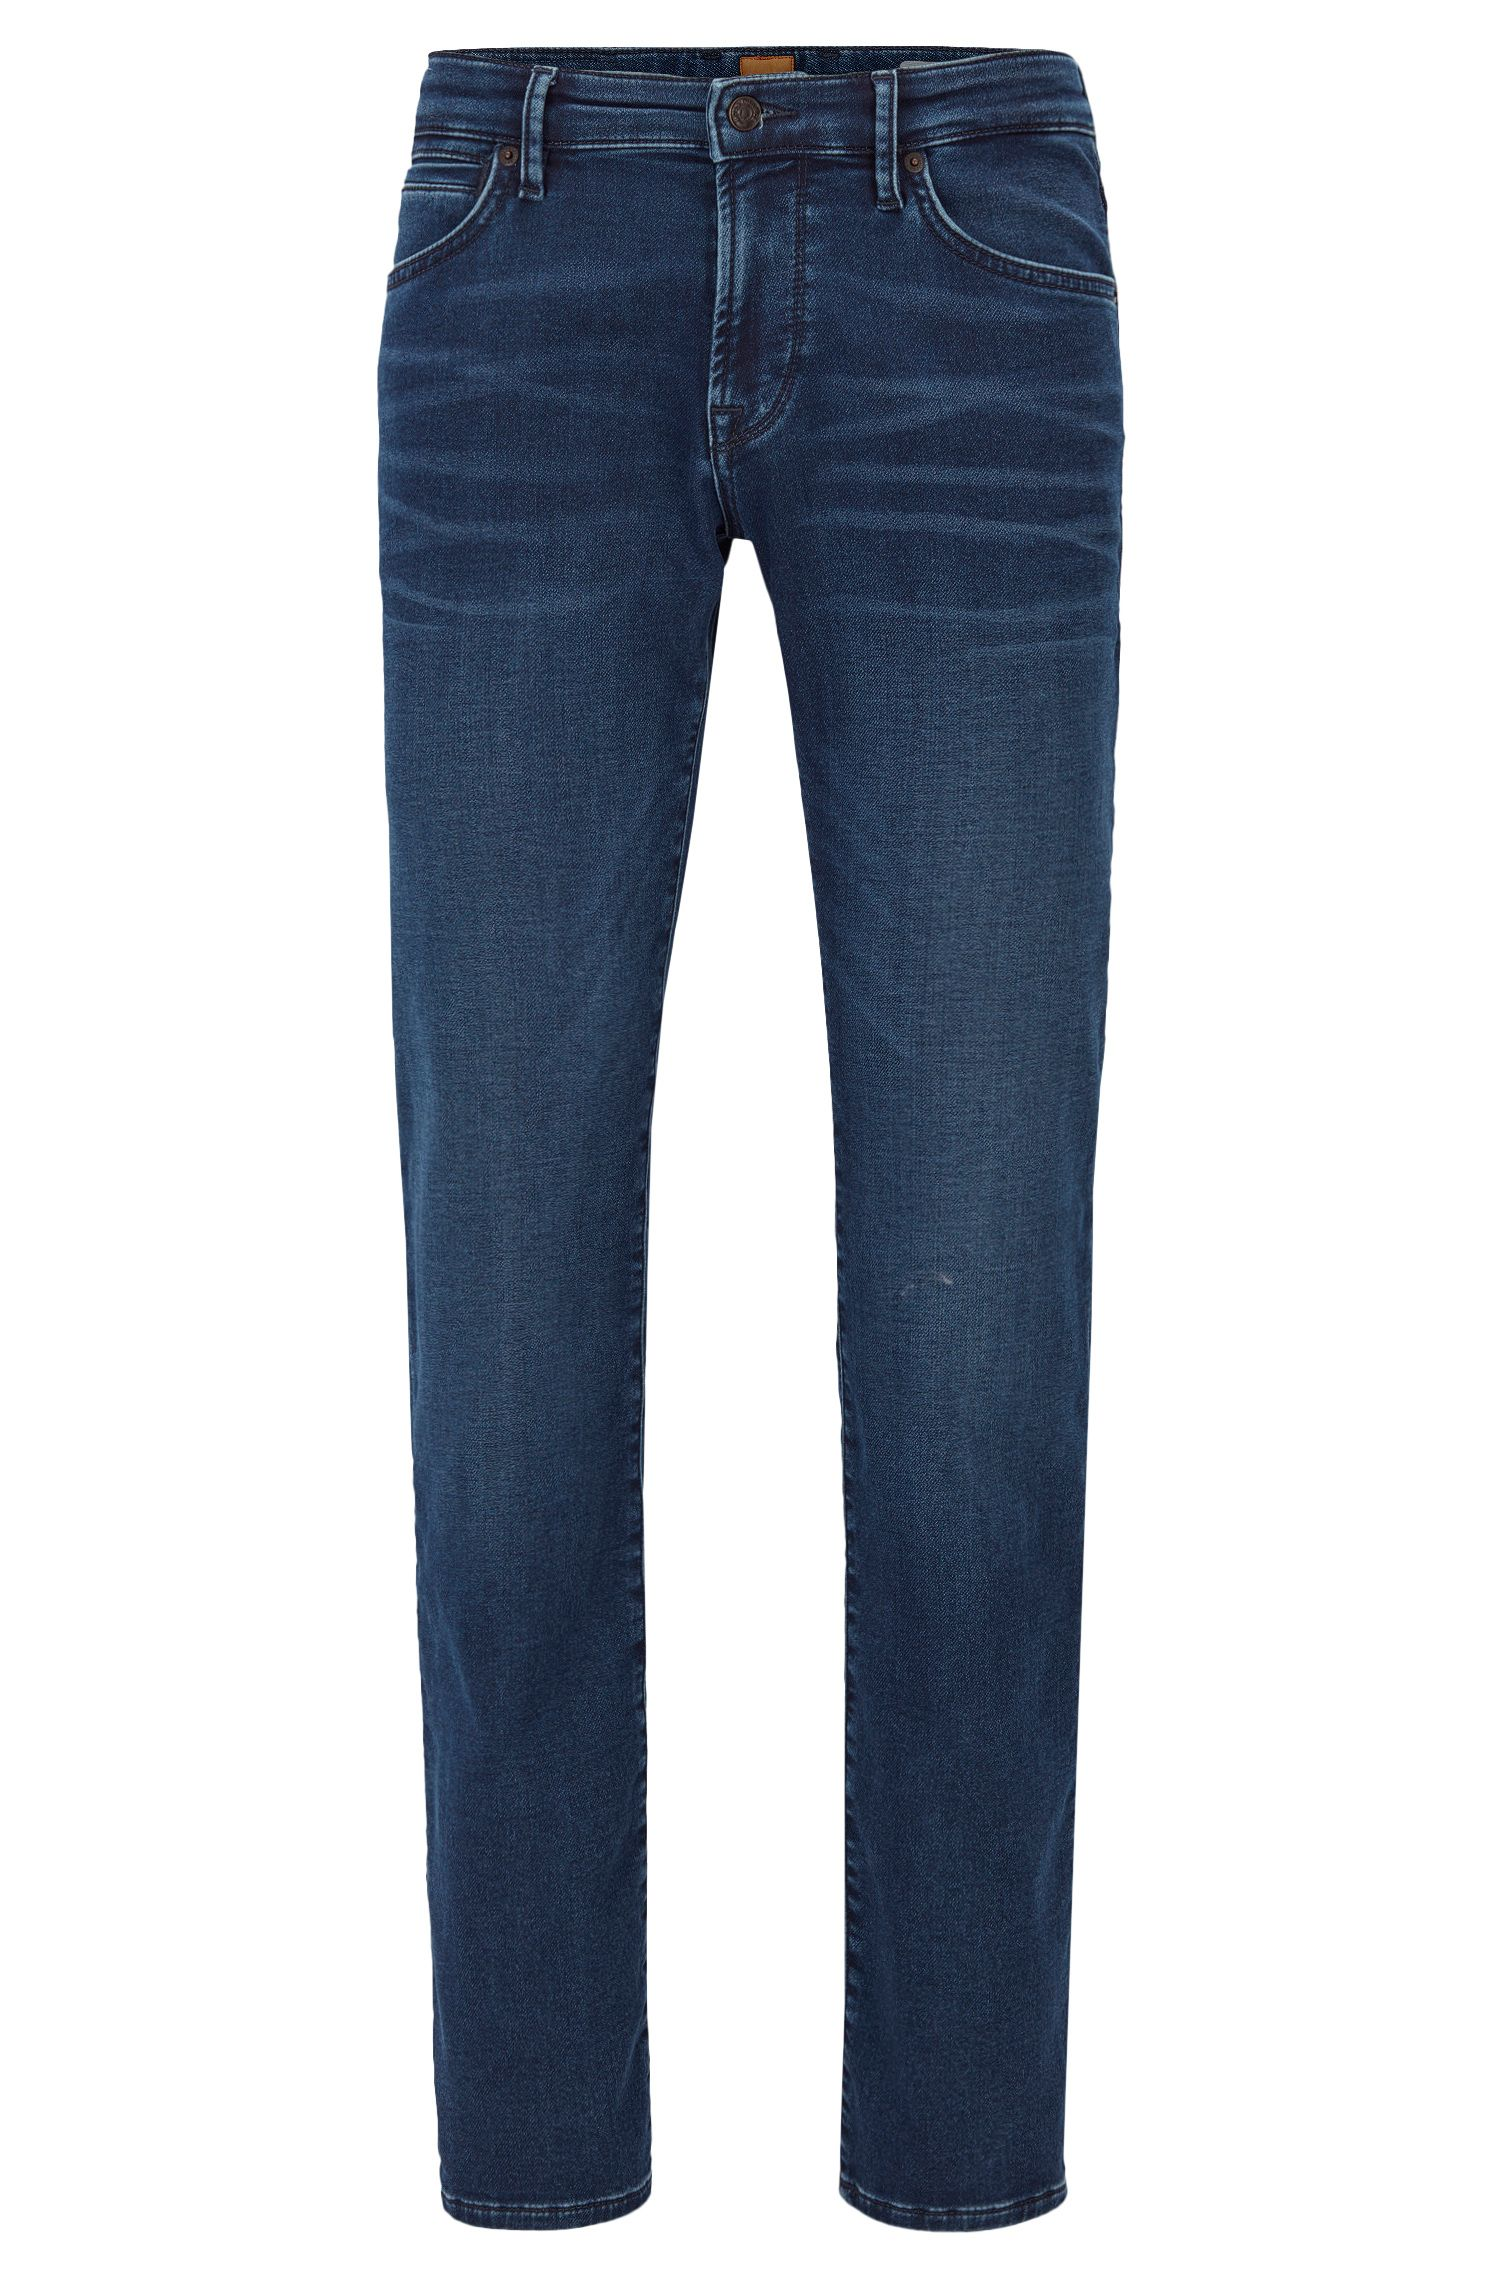 Regular-fit jeans in knitted stretch denim